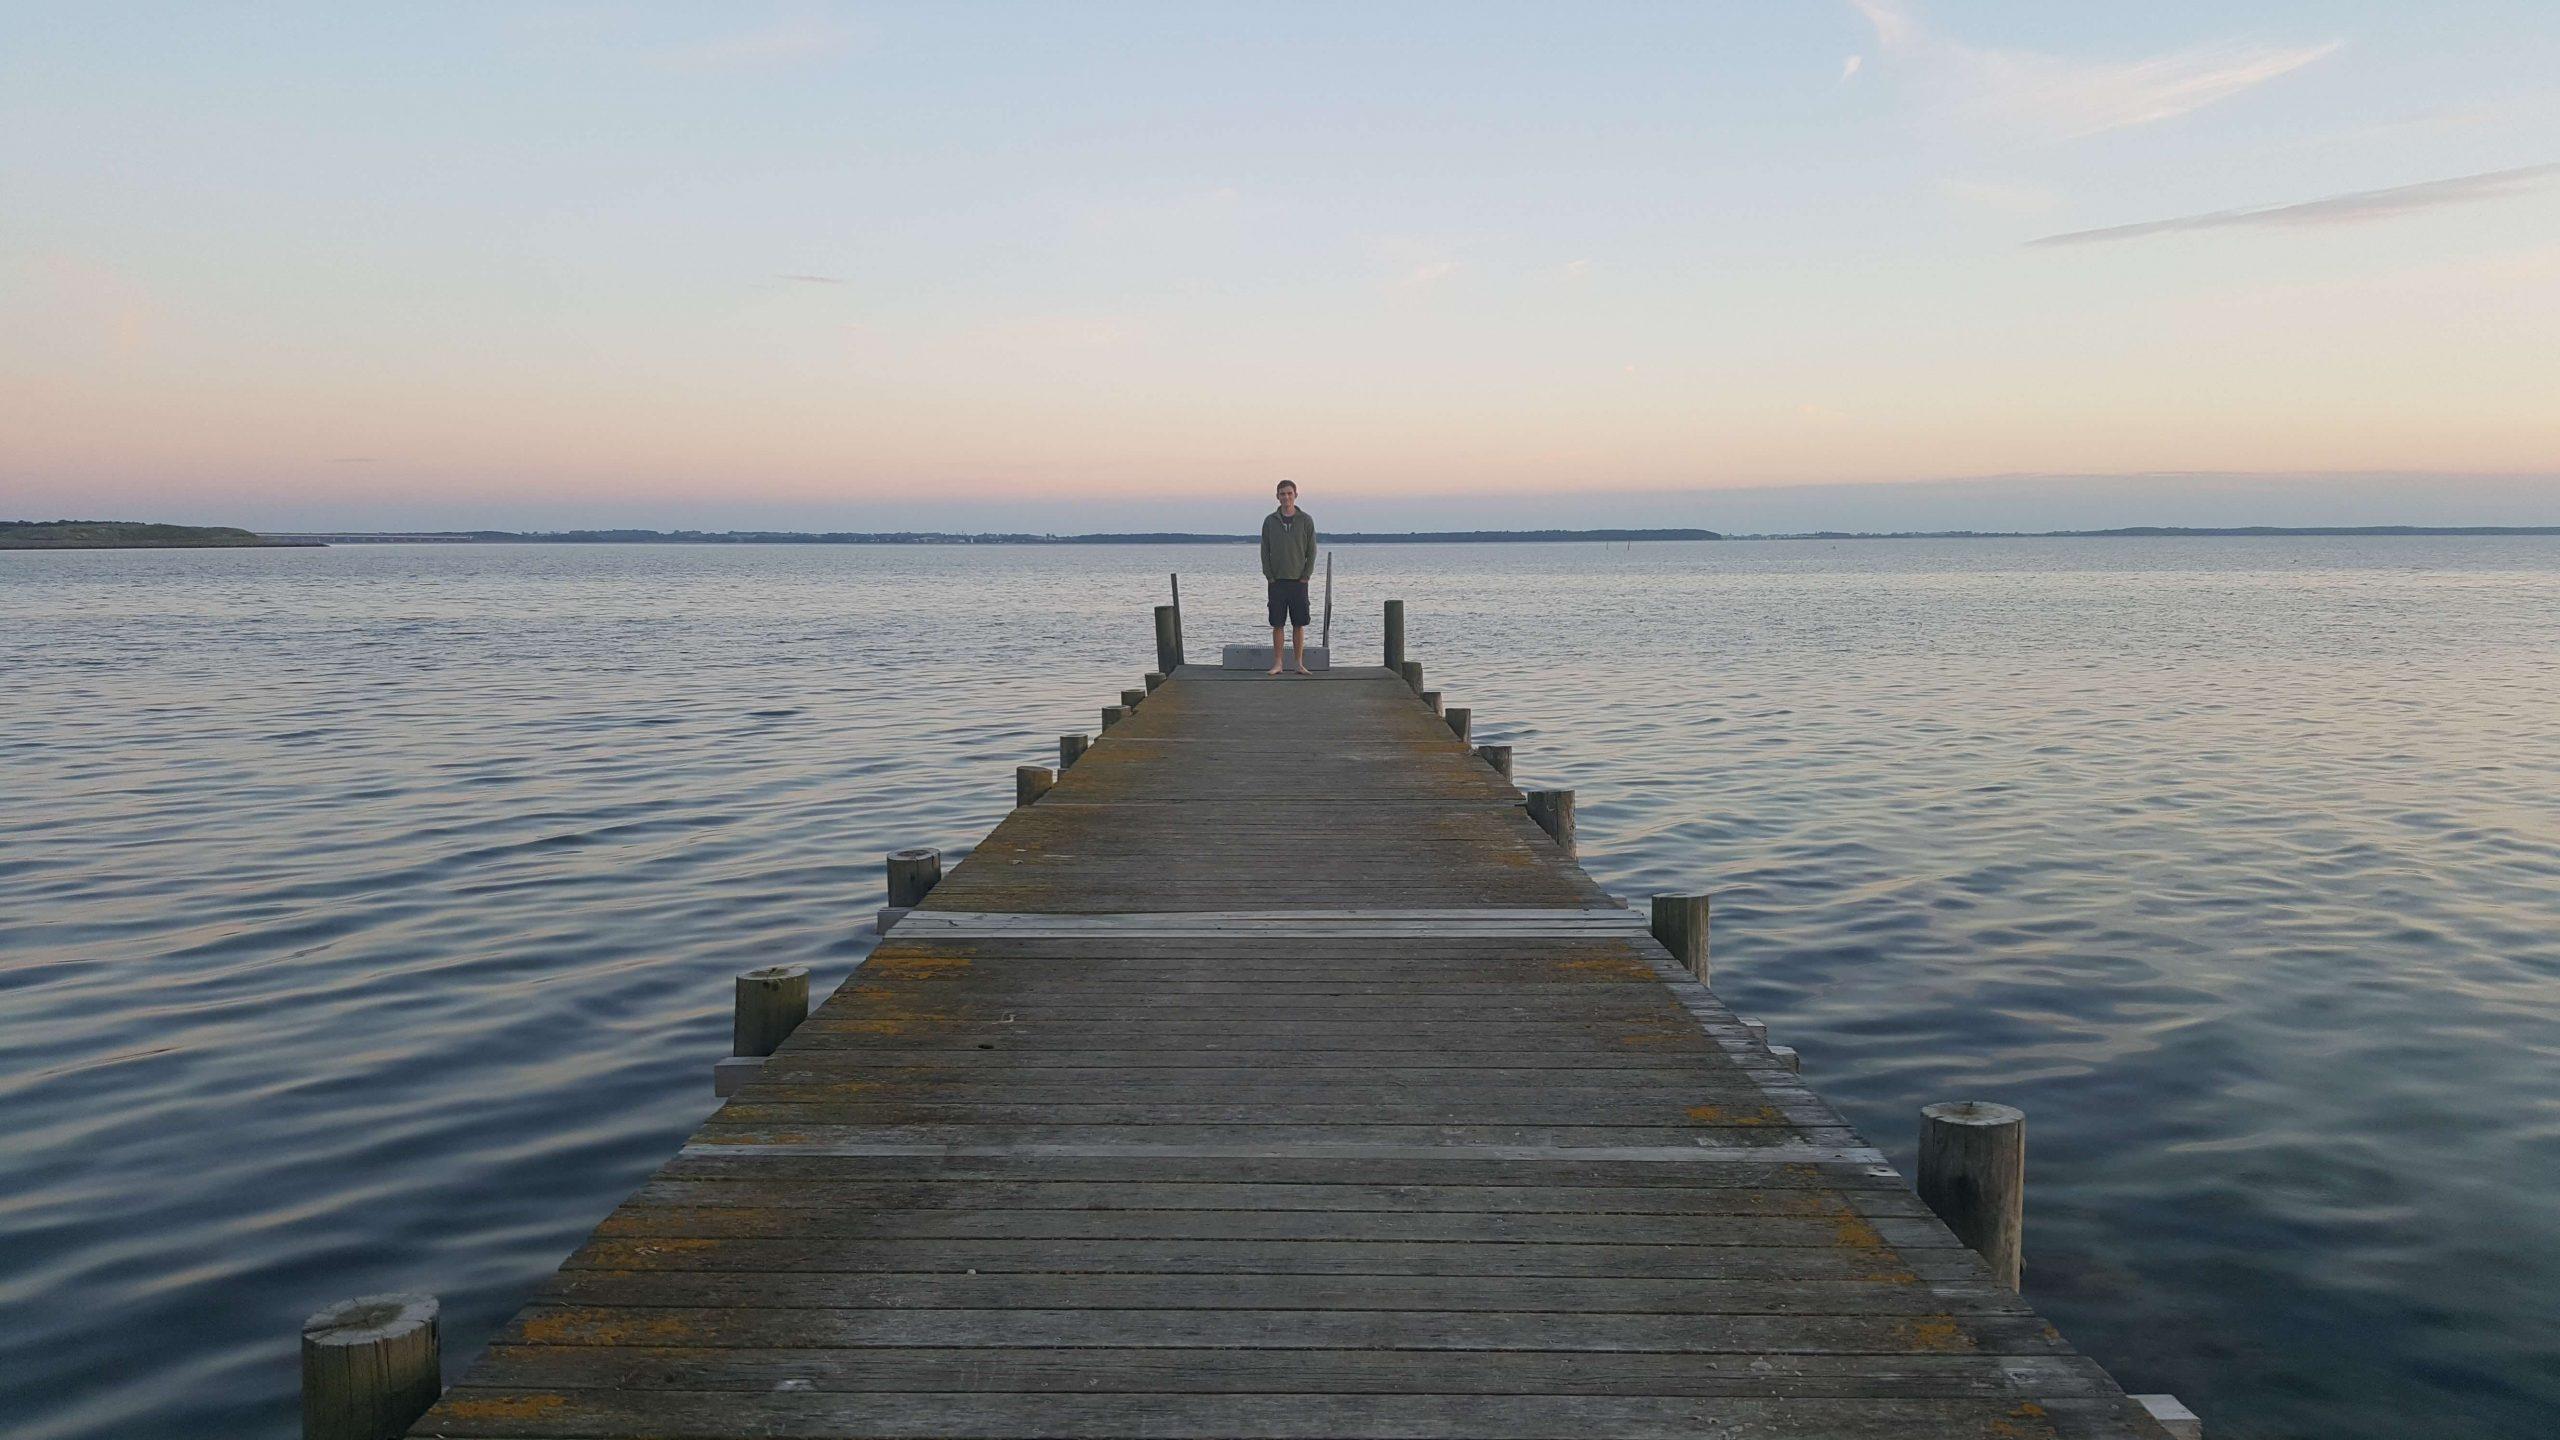 Reaching the Baltic Sea